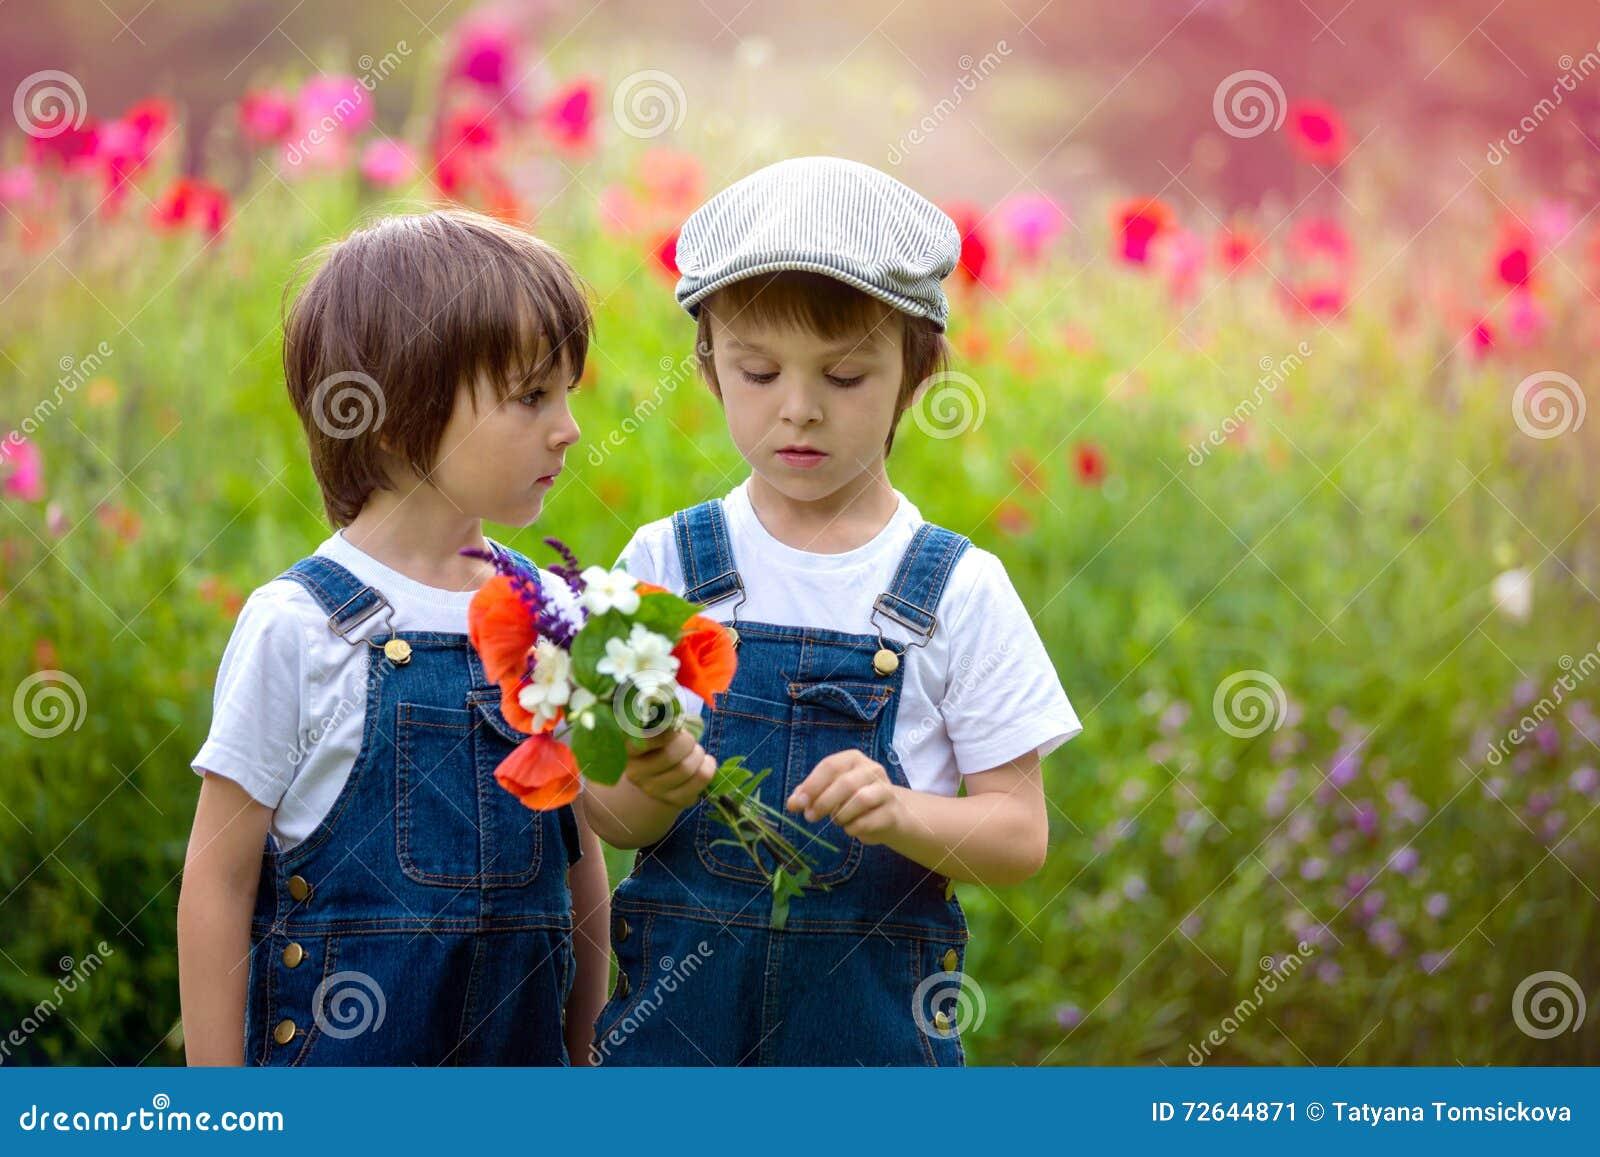 9210598811 Two cute preschool children, boy brothers, in poppy field, holding a  bouquet of